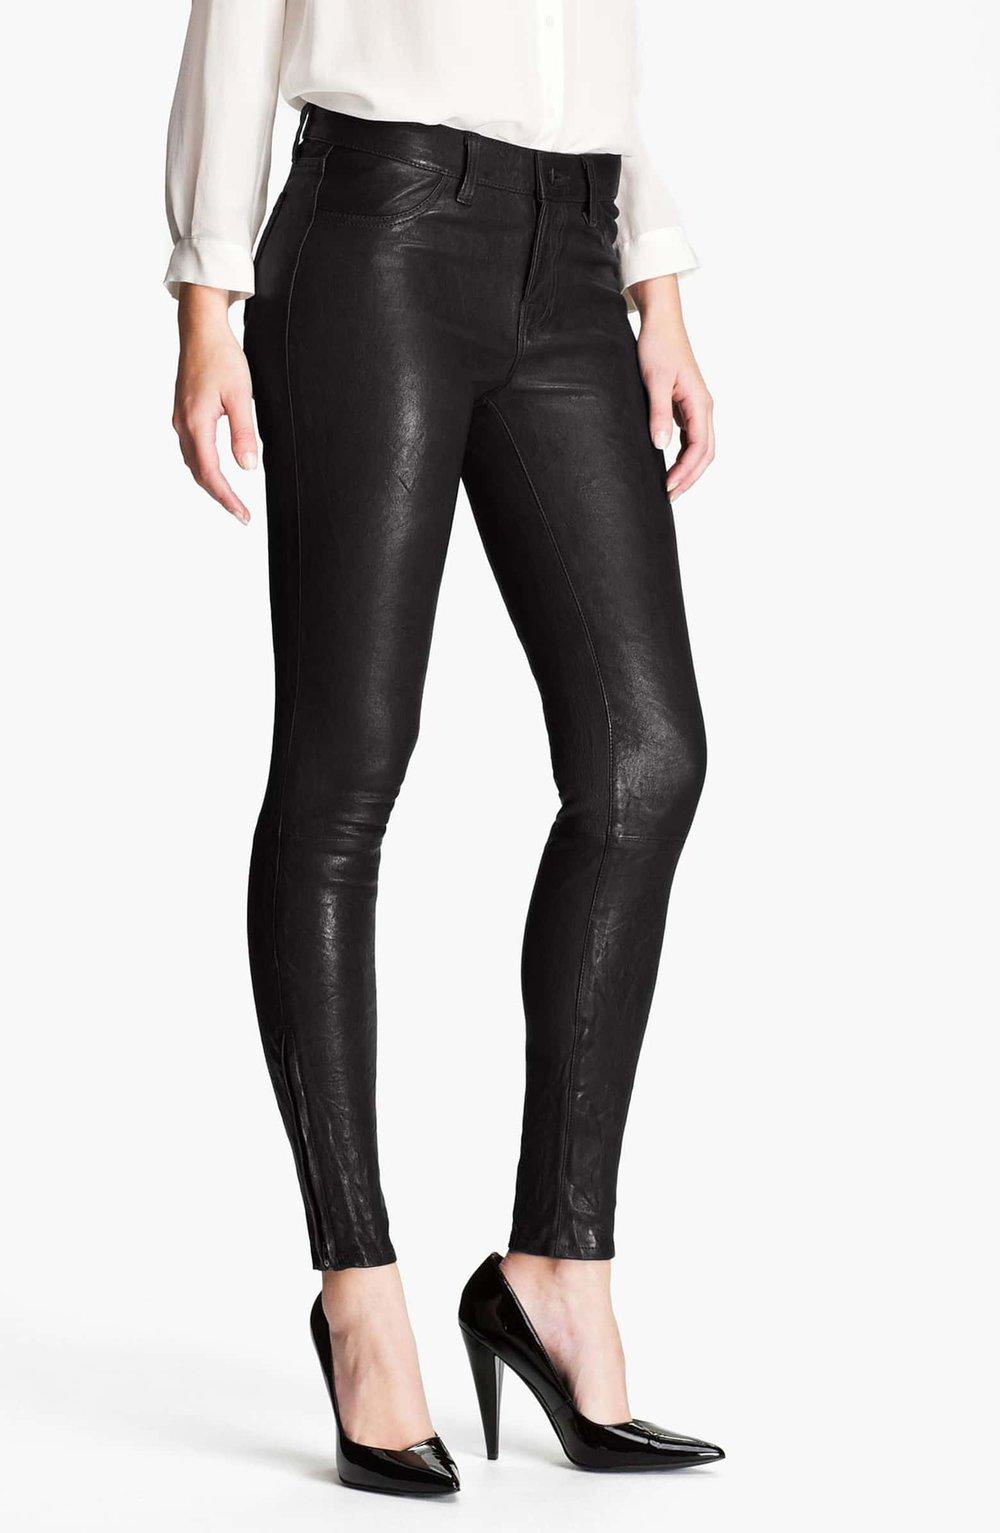 Jbrand Leather.jpg